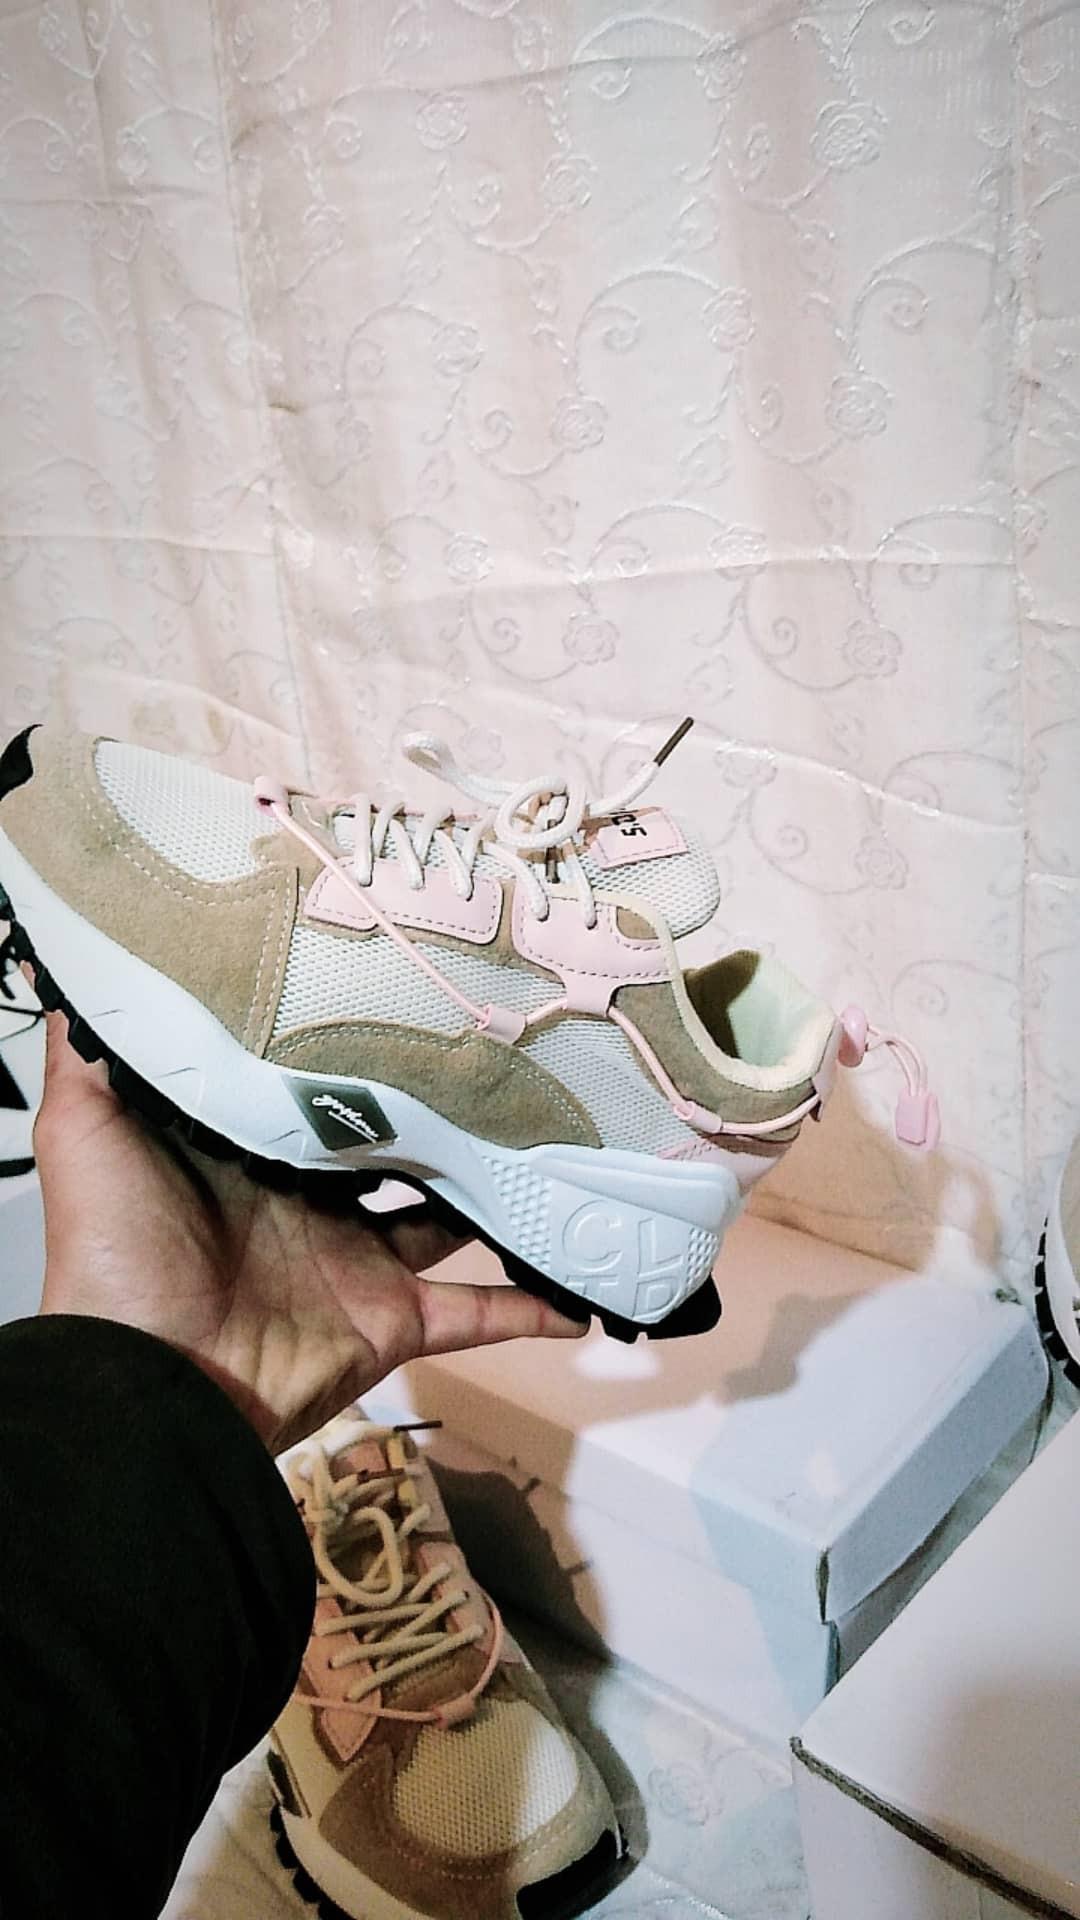 chaussure-femme-nouvelle-collection-2021